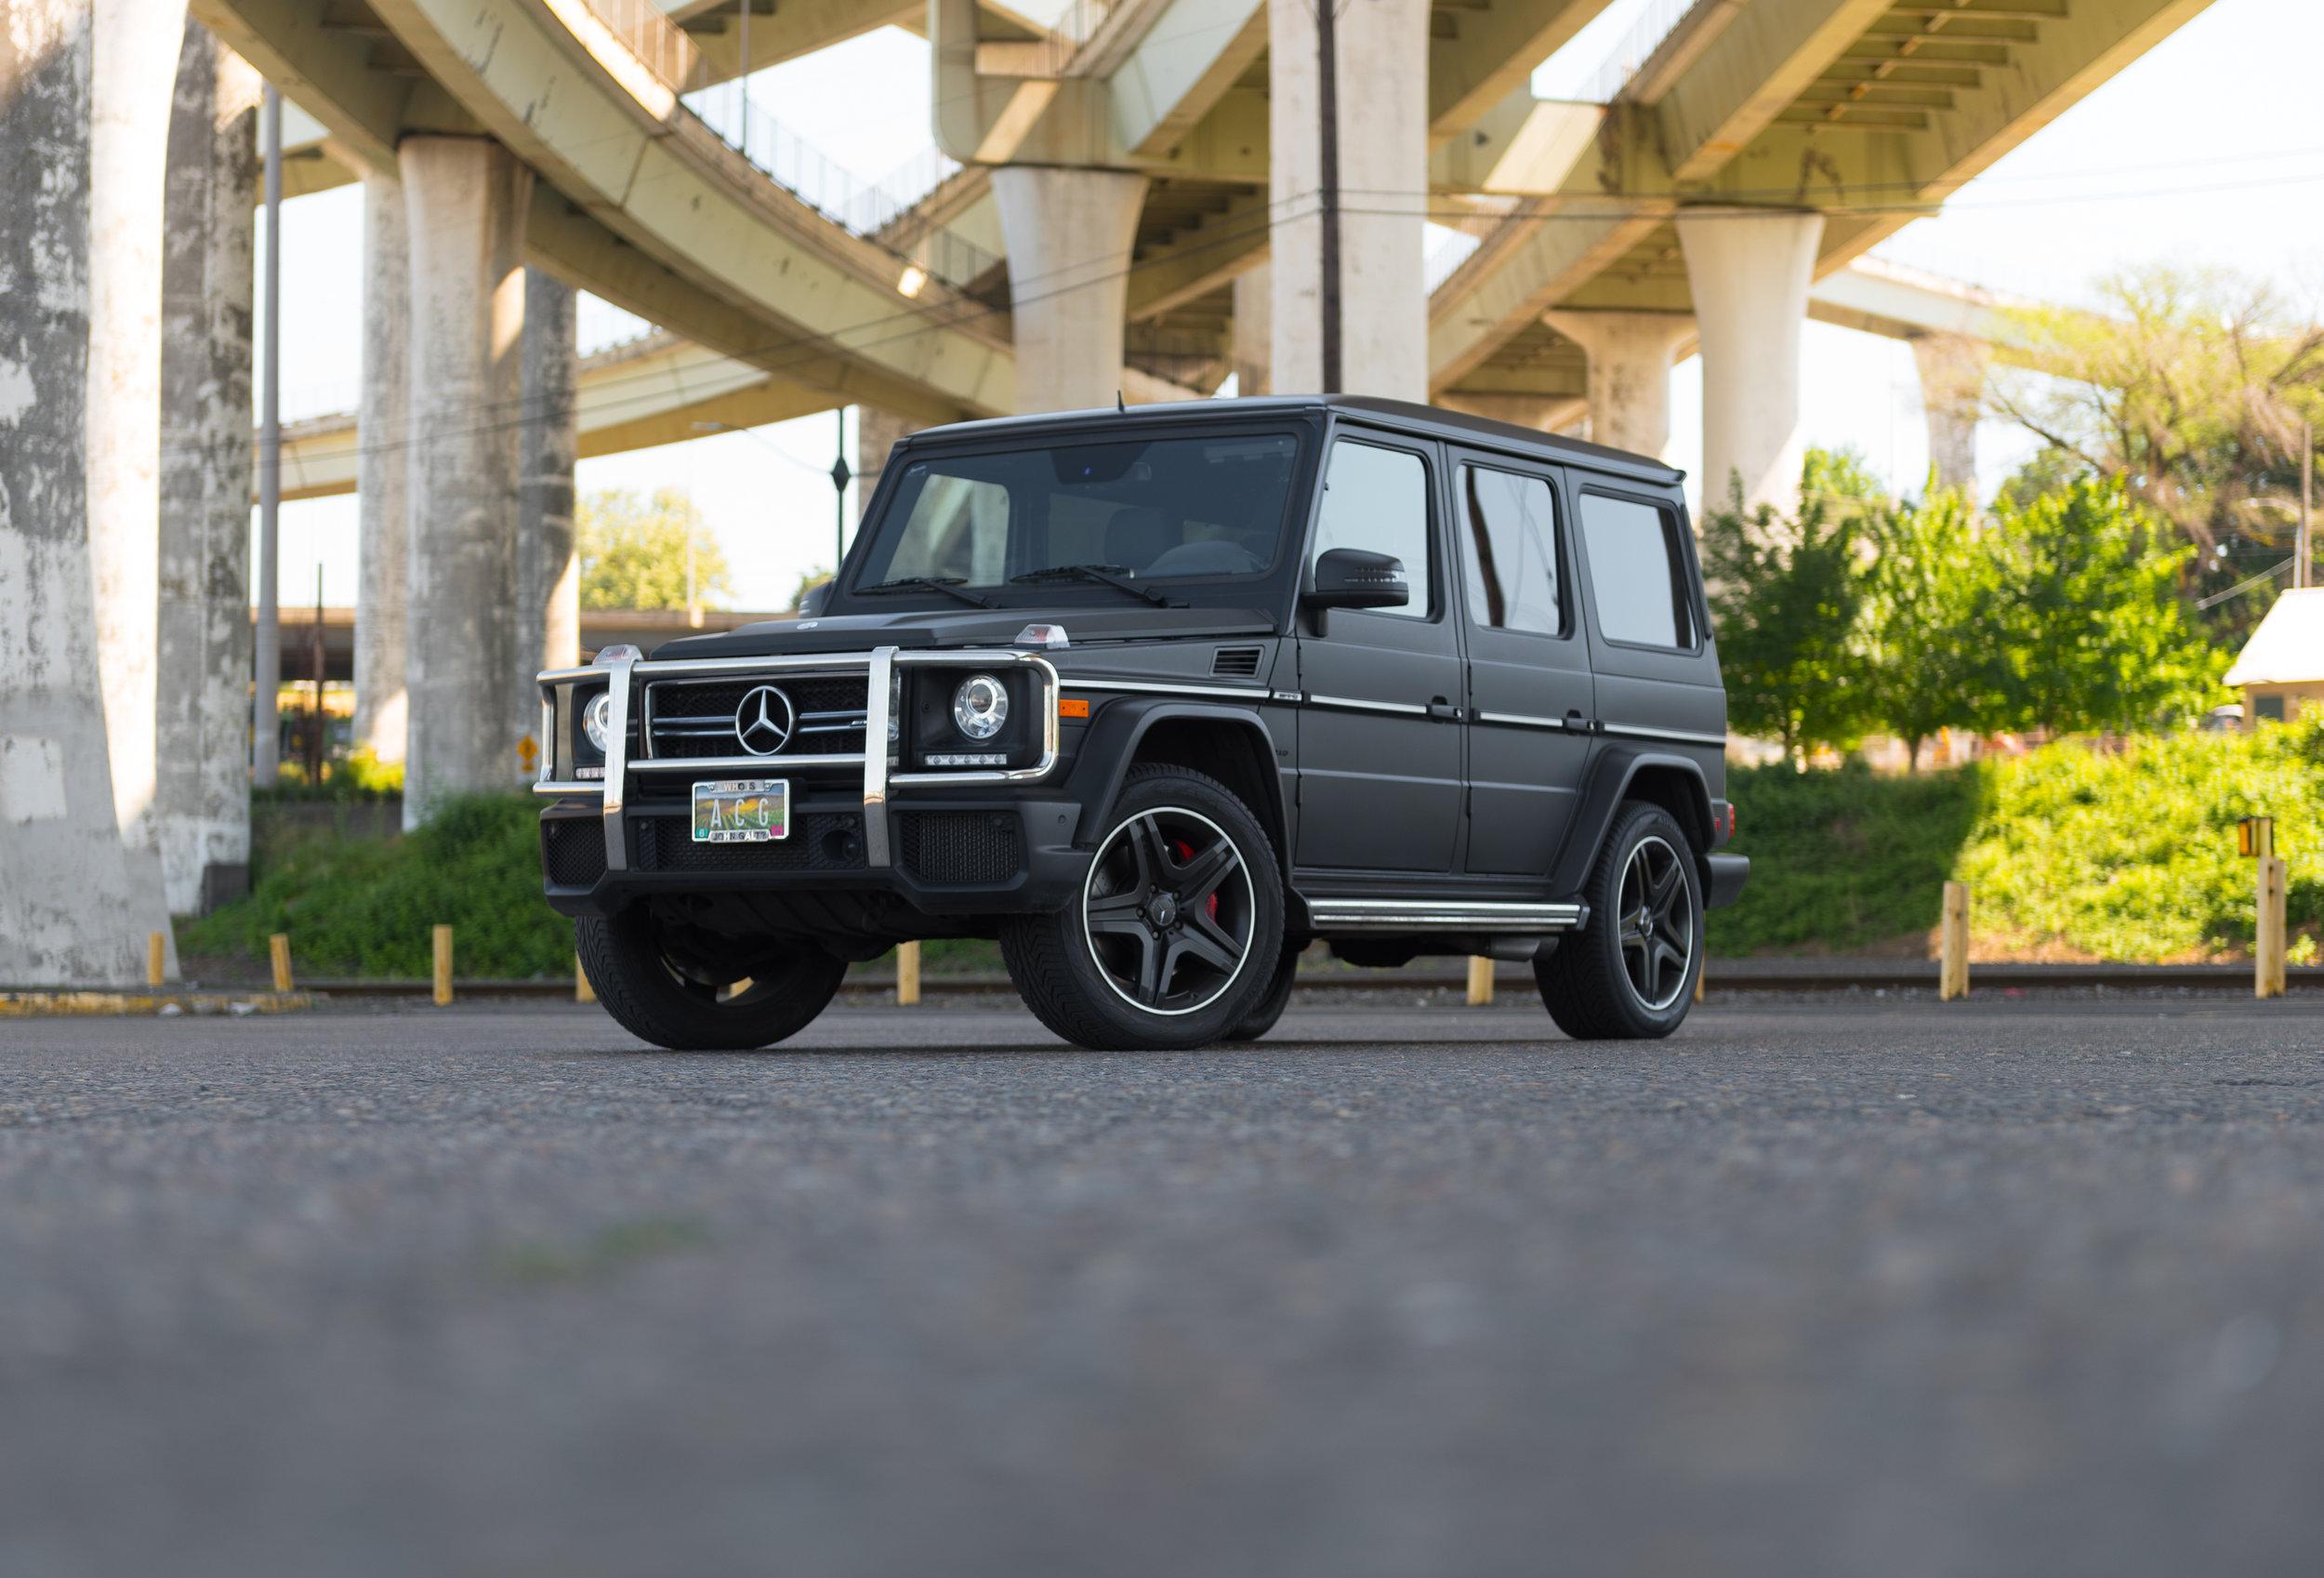 g-wagon-exterior-2.jpg